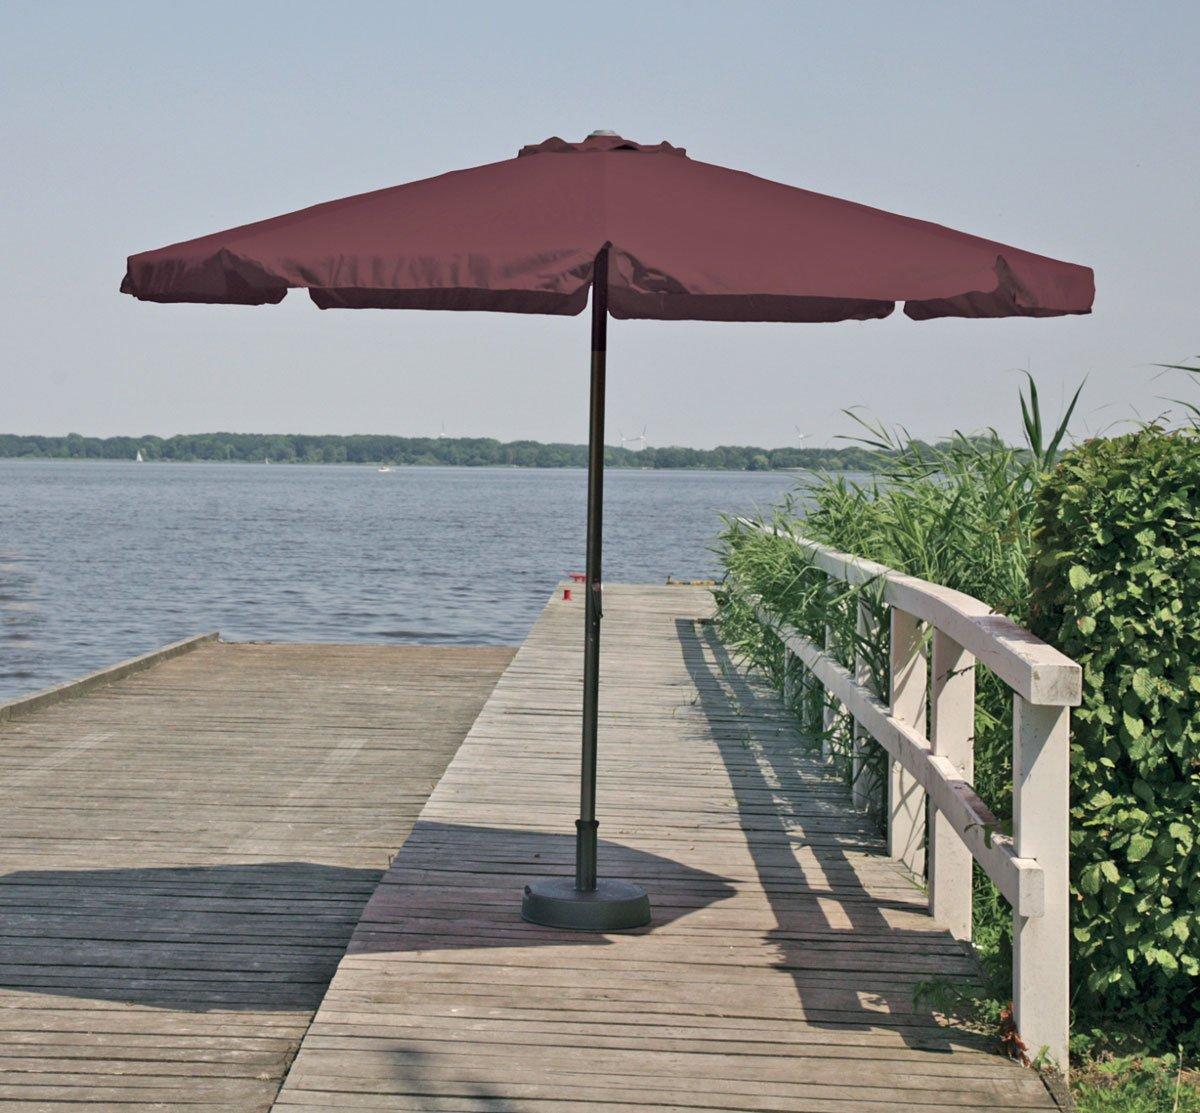 Alu-Marktschirm Sonnenschirm Gartenschirm Schirm ca. 300 cm mocca günstig bestellen